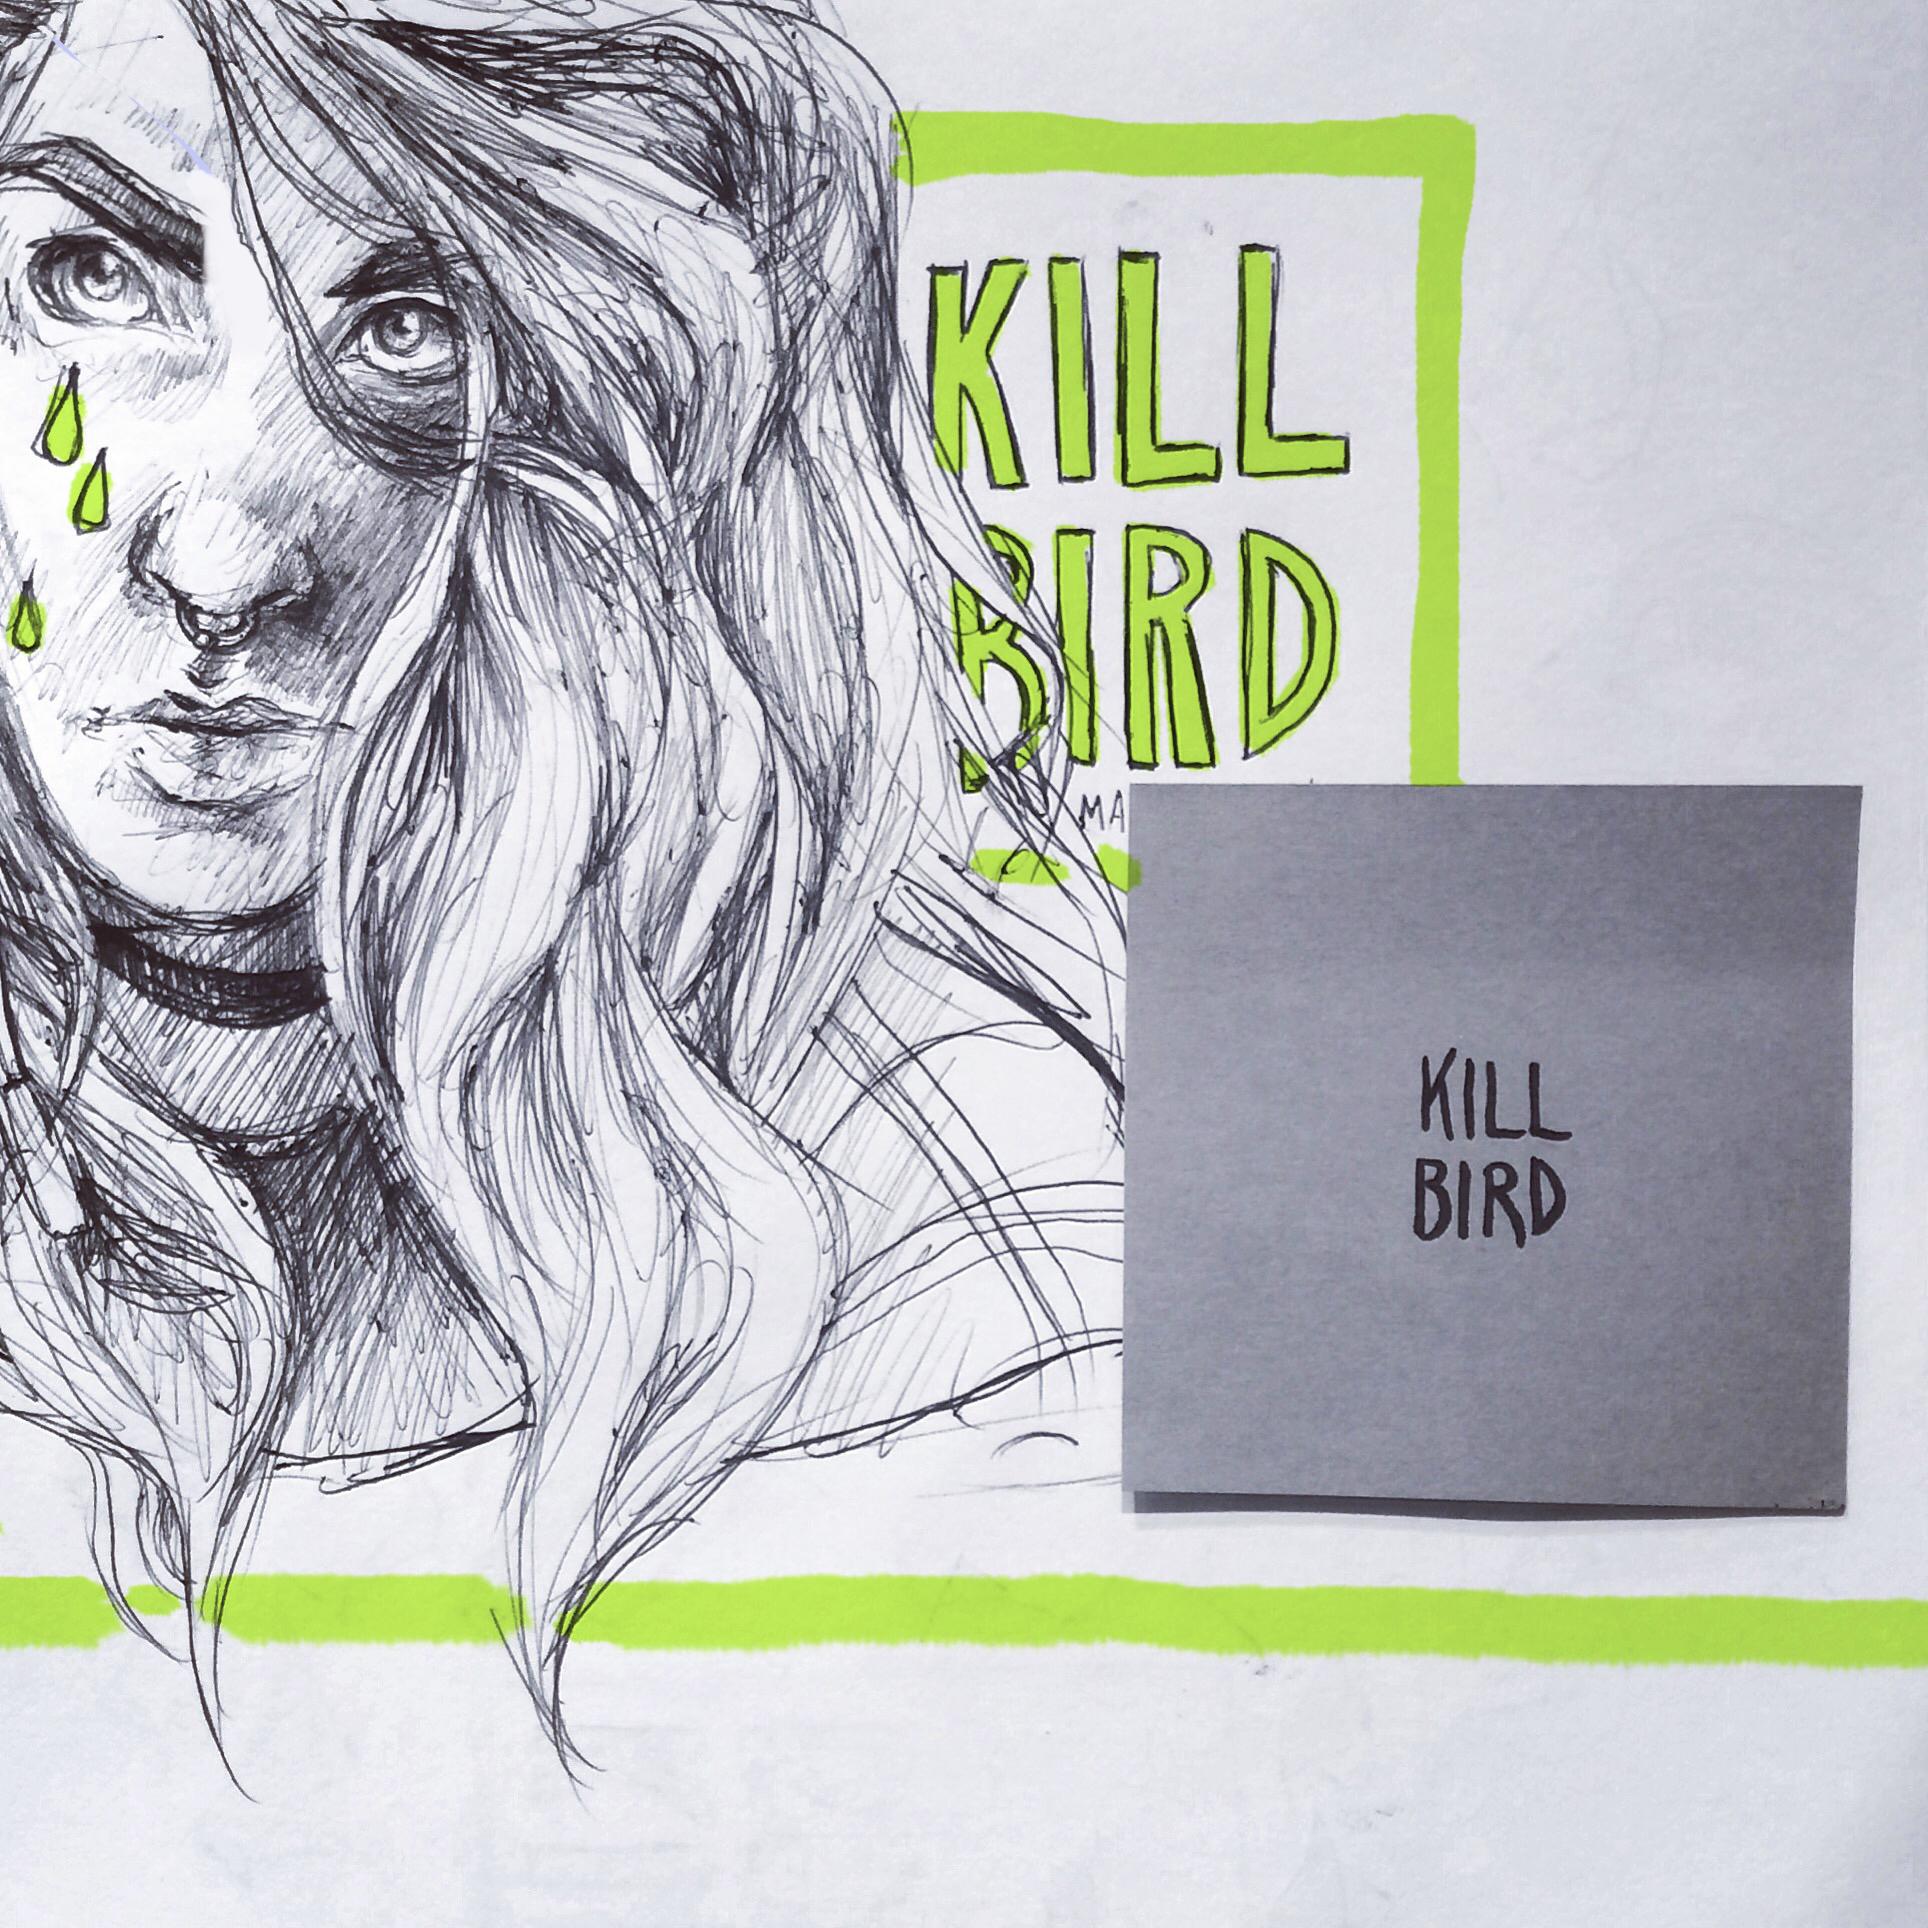 killbird.jpg